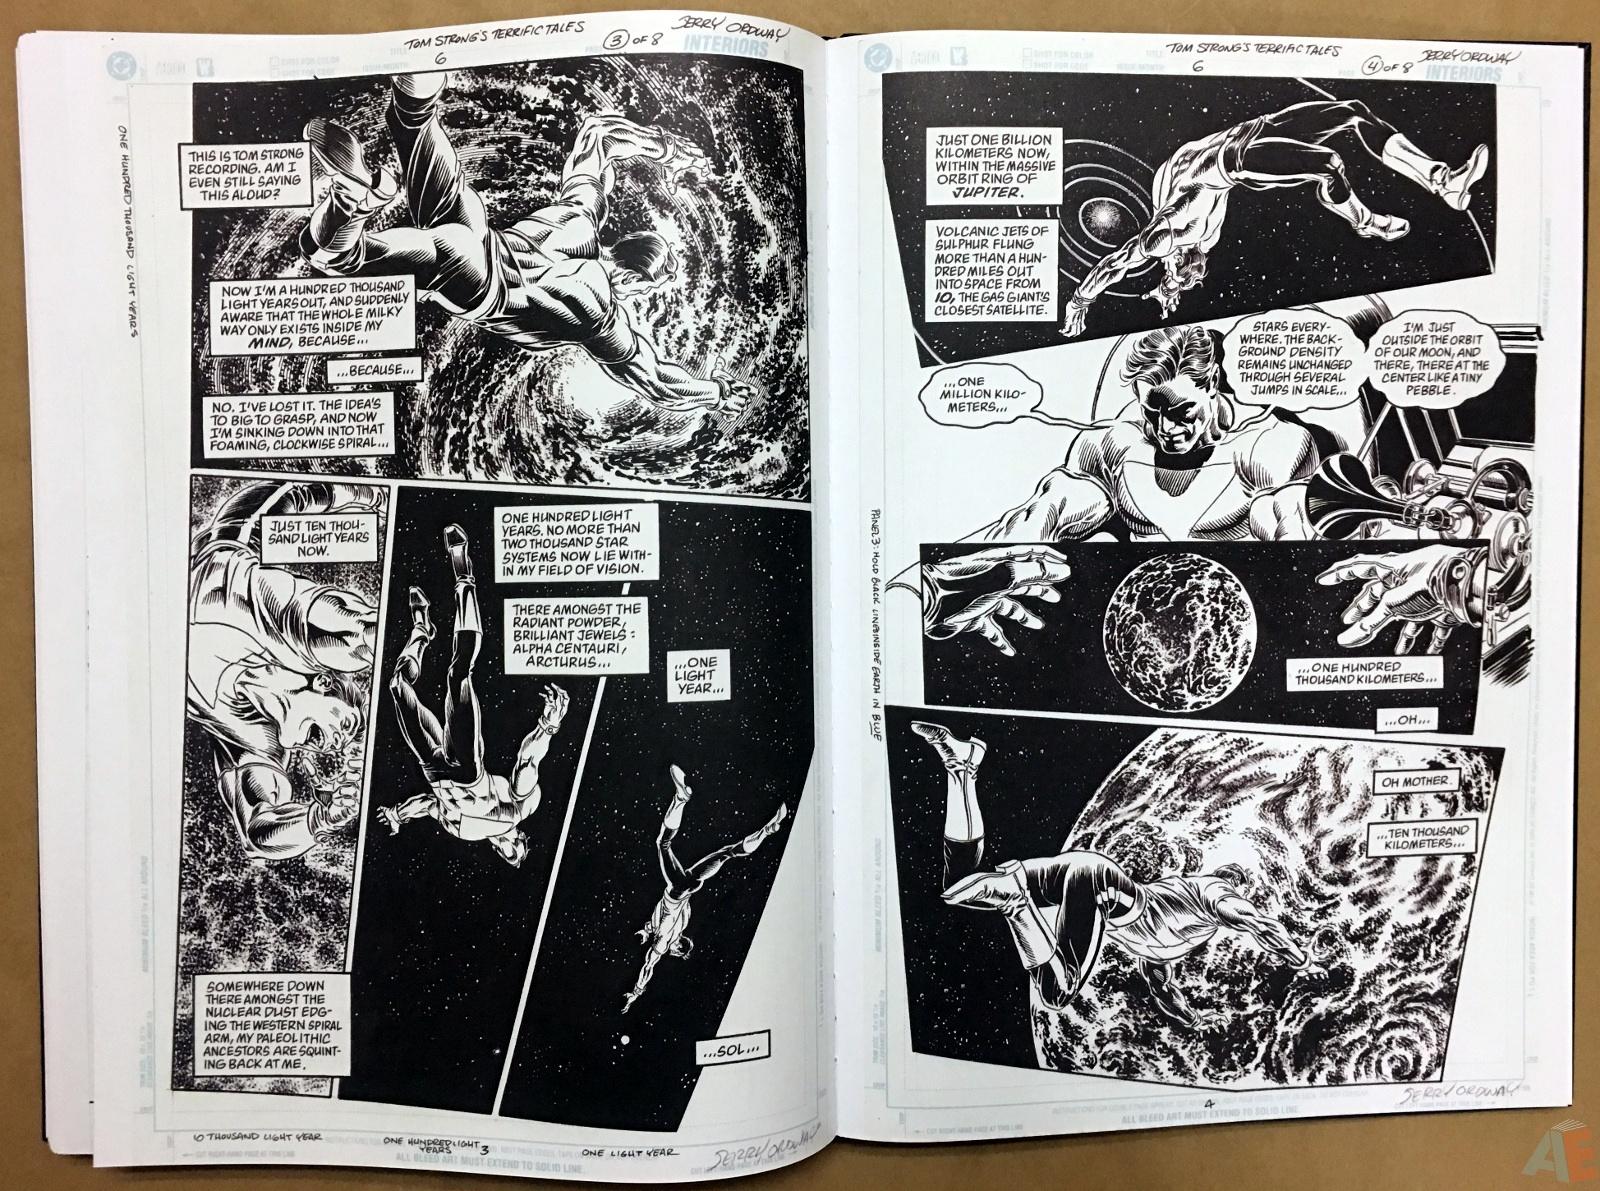 America's Best Comics Artist's Edition